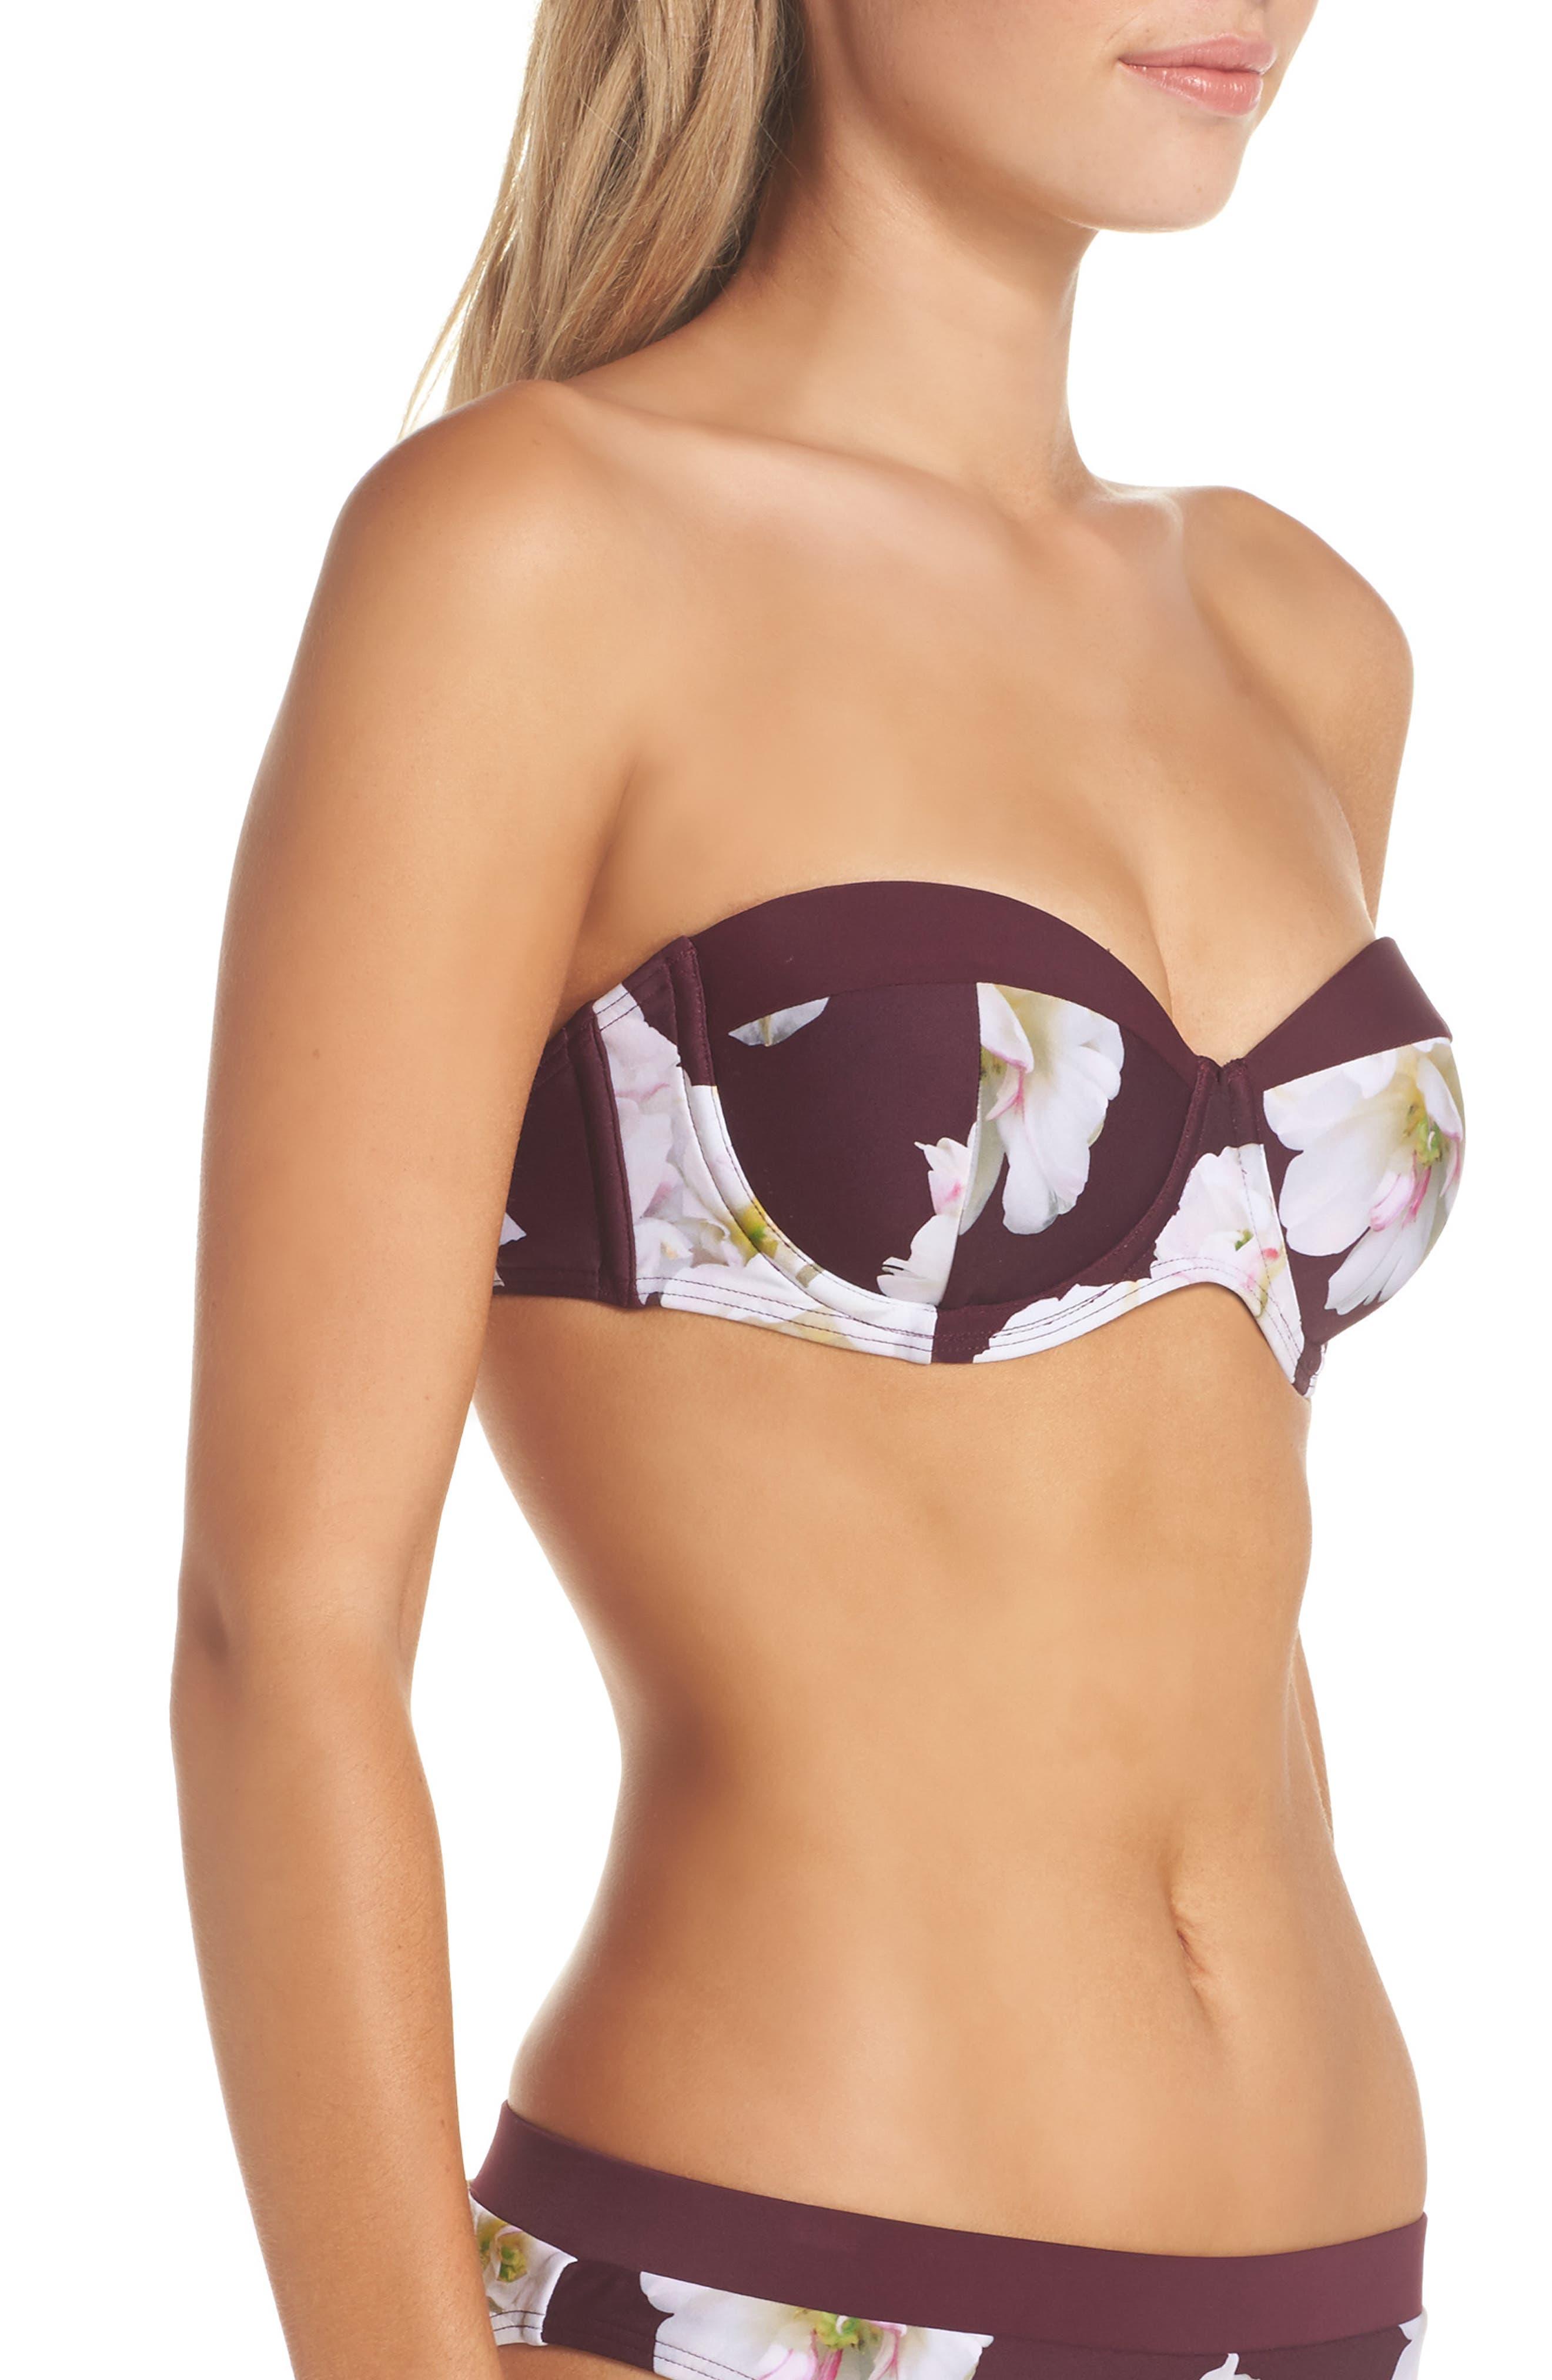 Gardea Gardenia Underwire Bikini Top,                             Alternate thumbnail 3, color,                             930